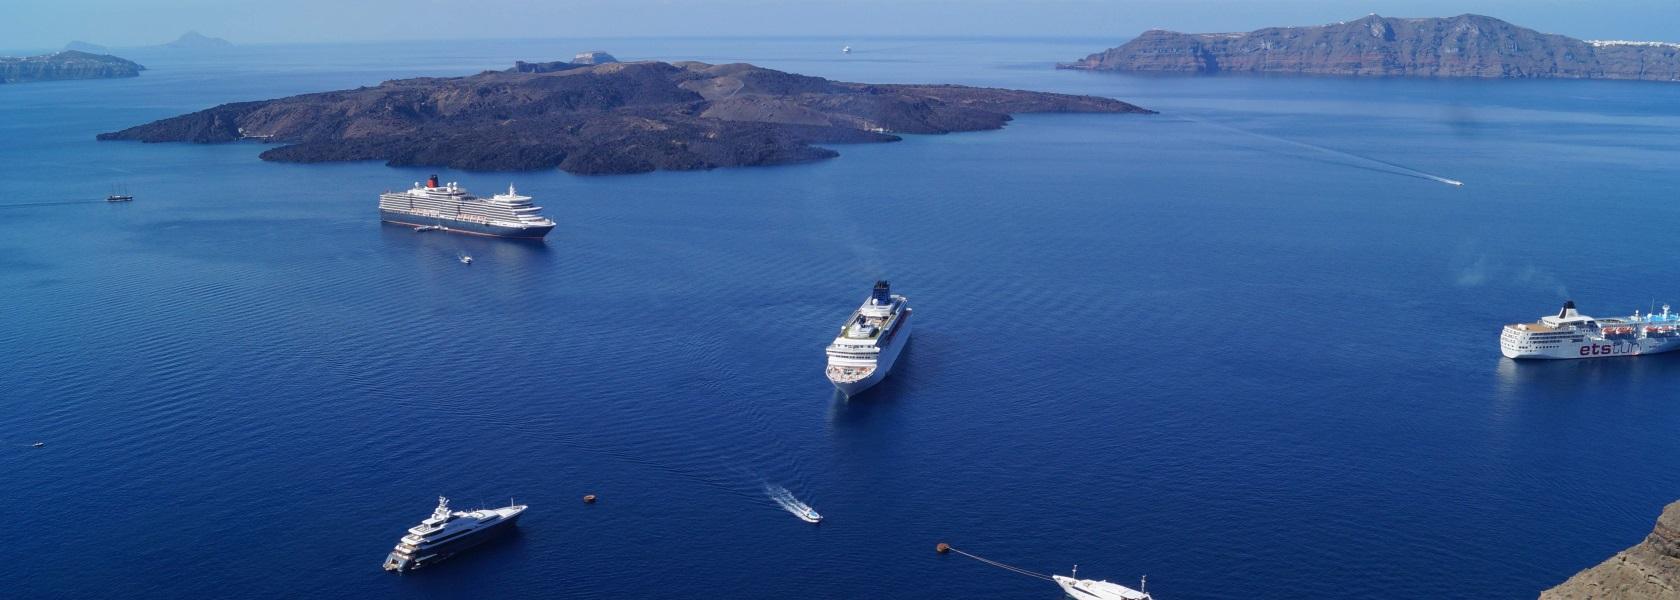 Loucas Hotel Santorini Greece Fira Hotels Santorini